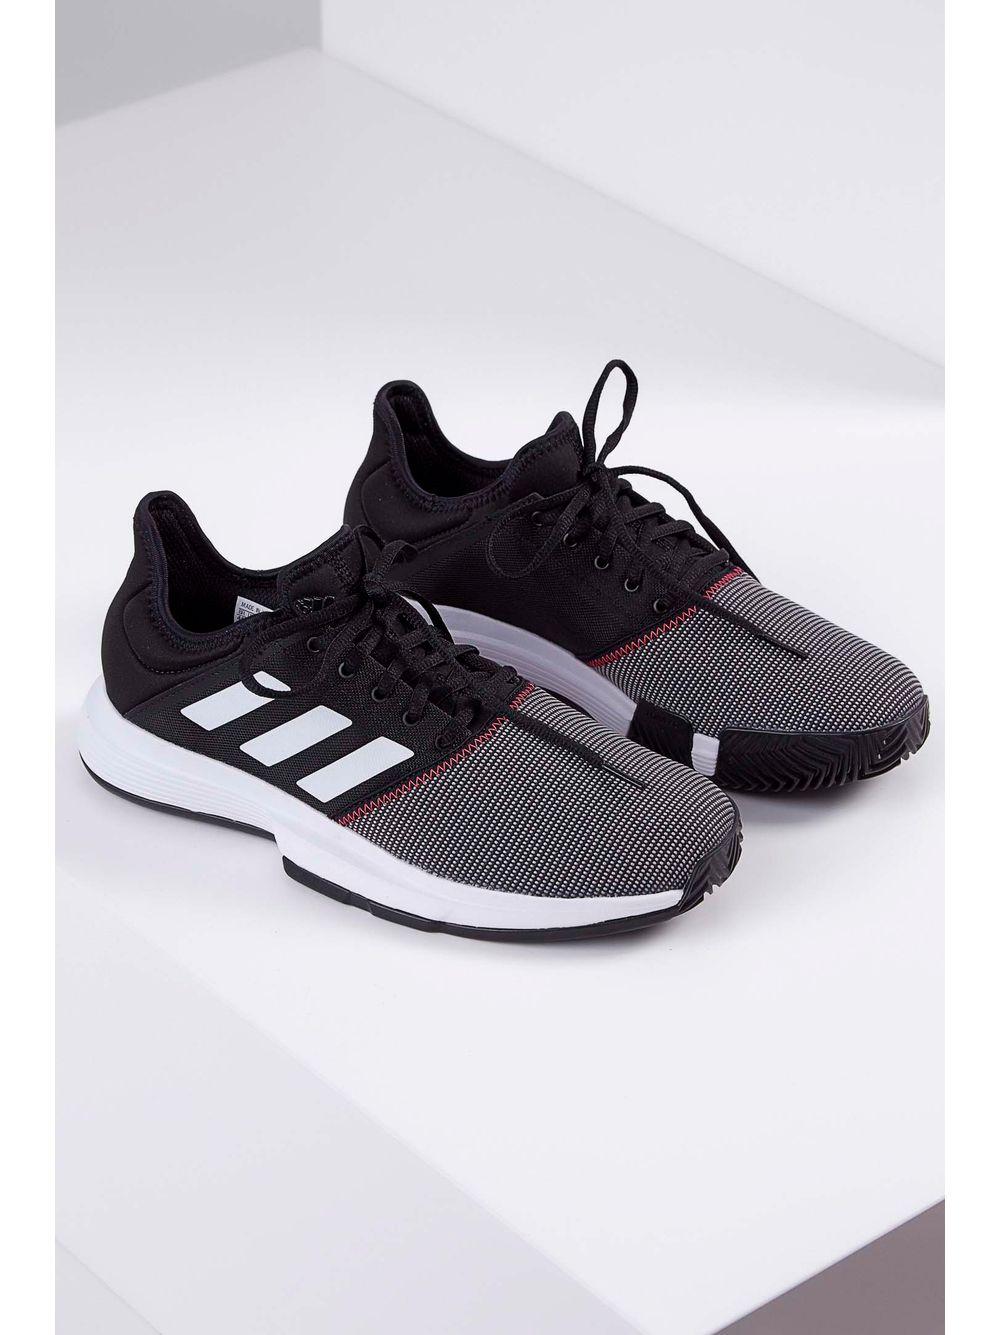 0998a79159b Tênis Adidas Gamecourt Shoes Preto - pittol